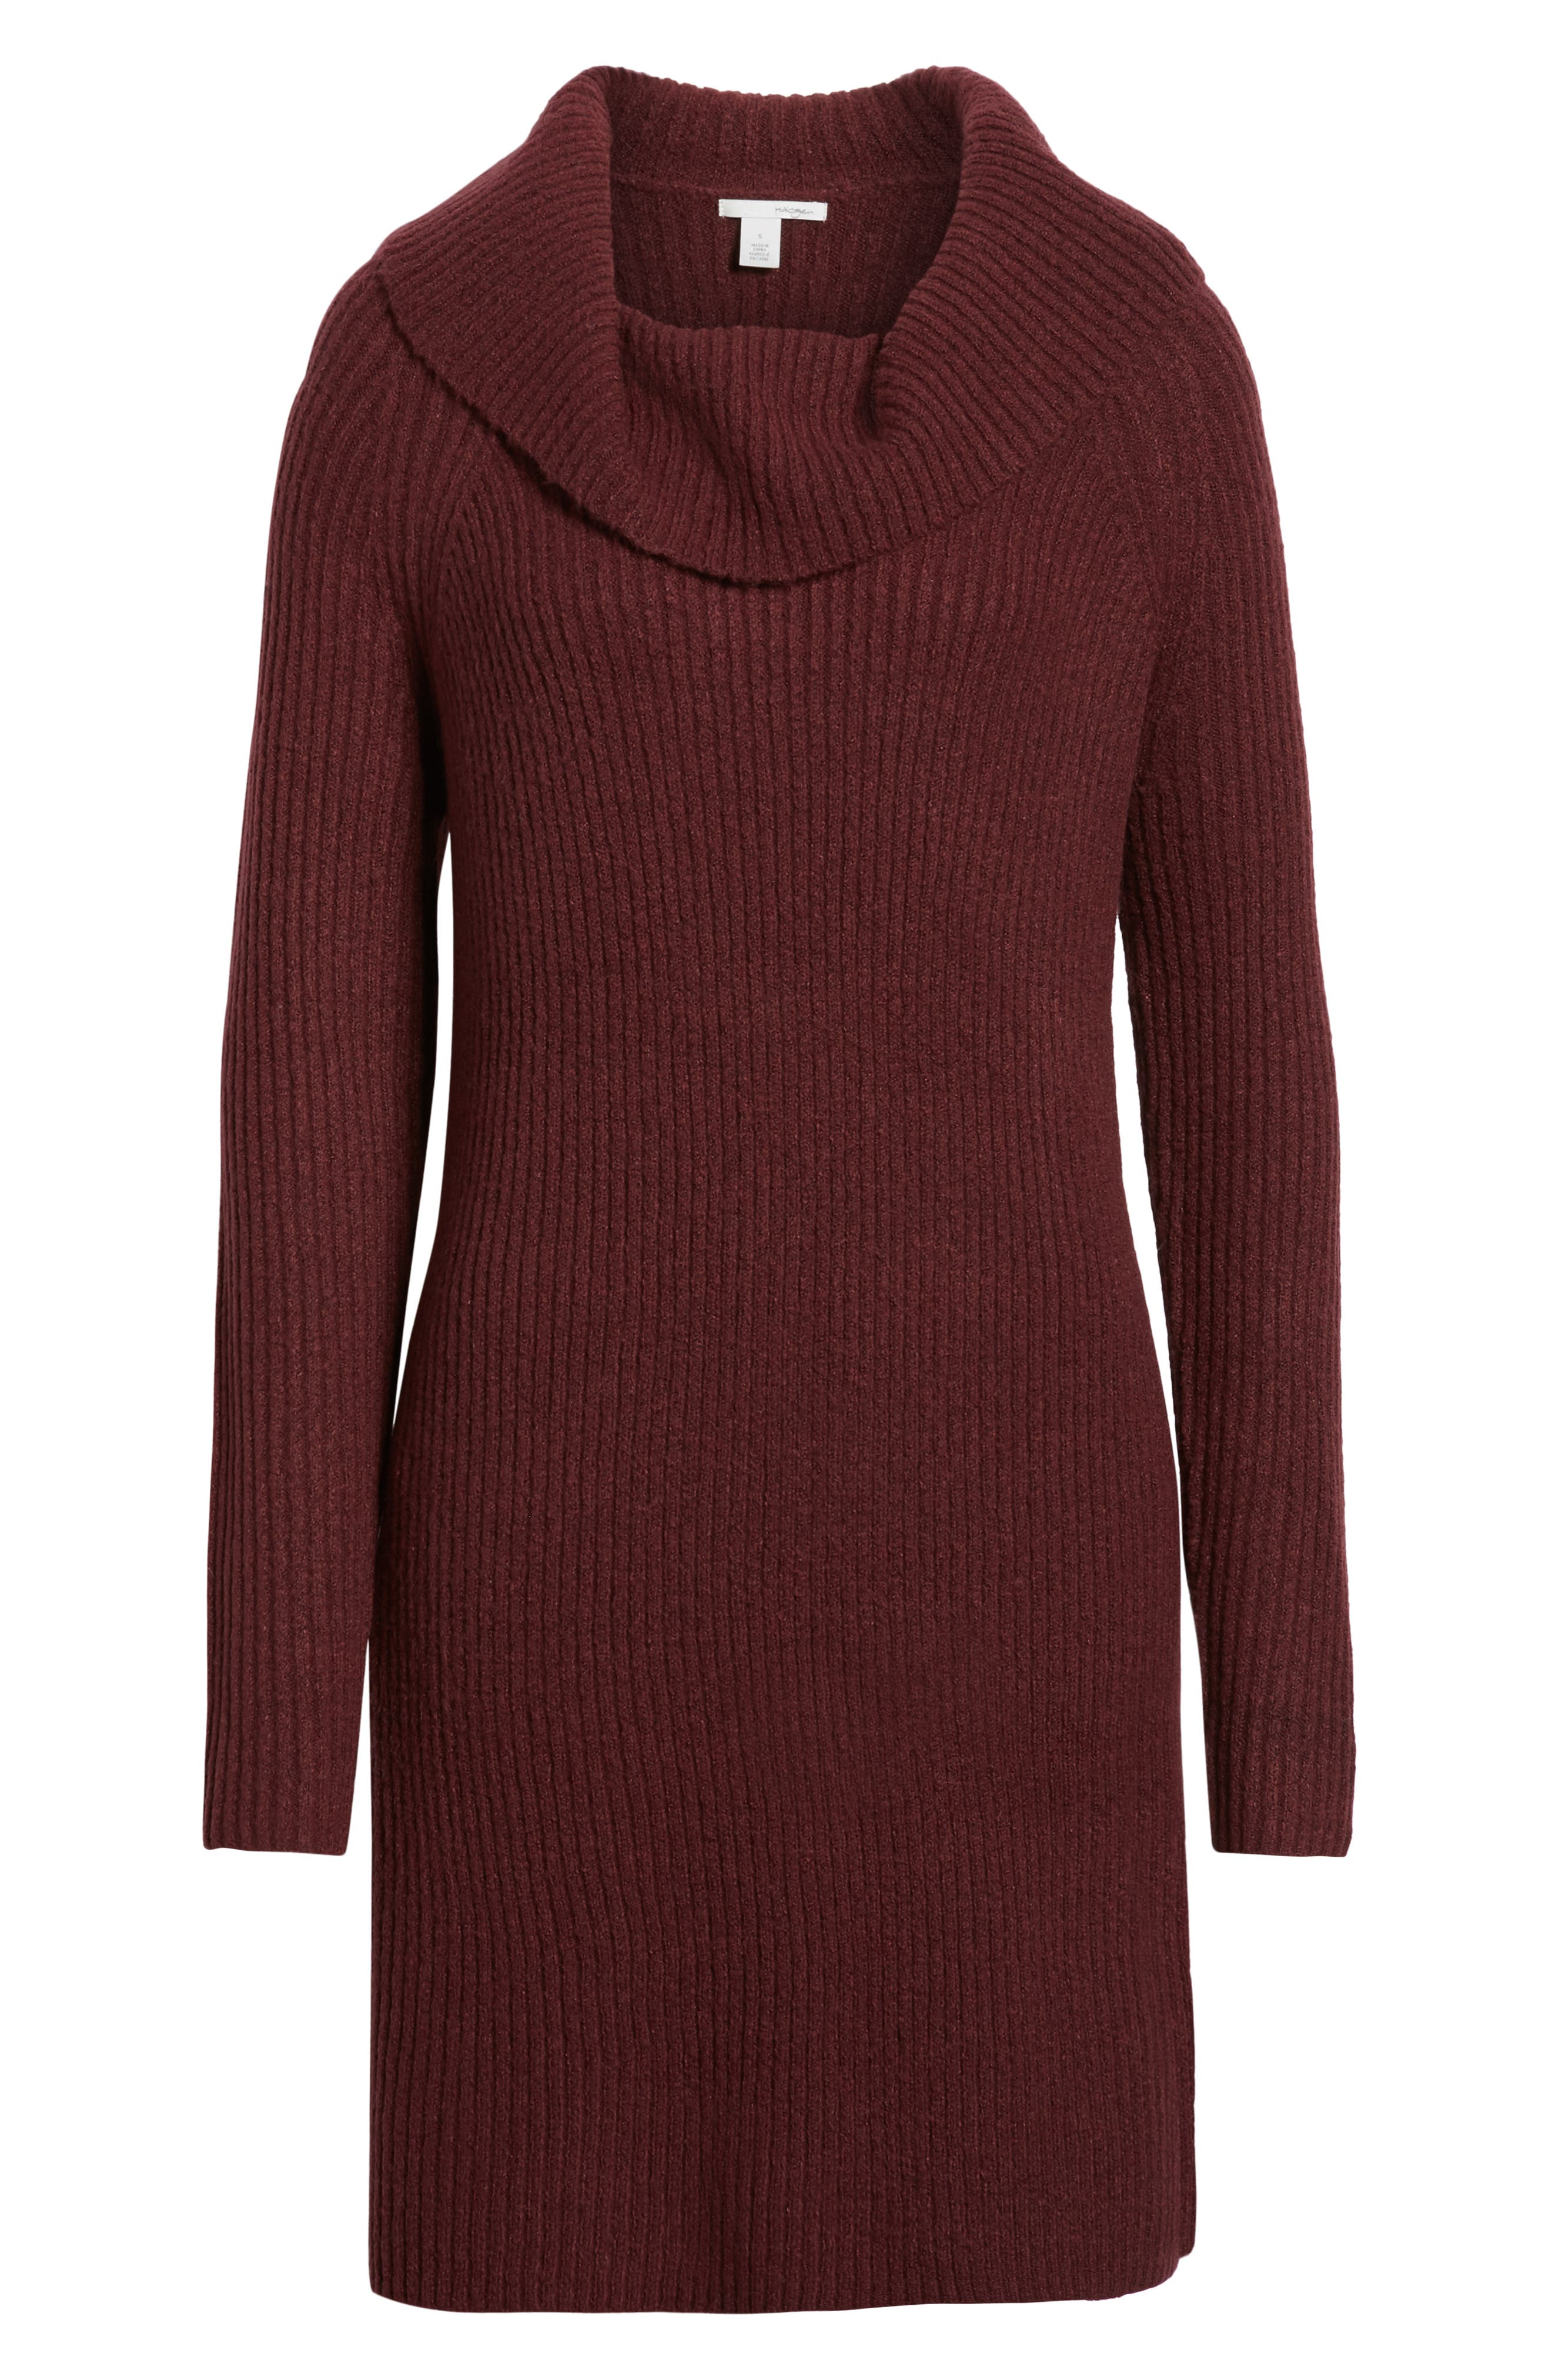 Halogen Cowl Neck Sweater Dress, Burgundy